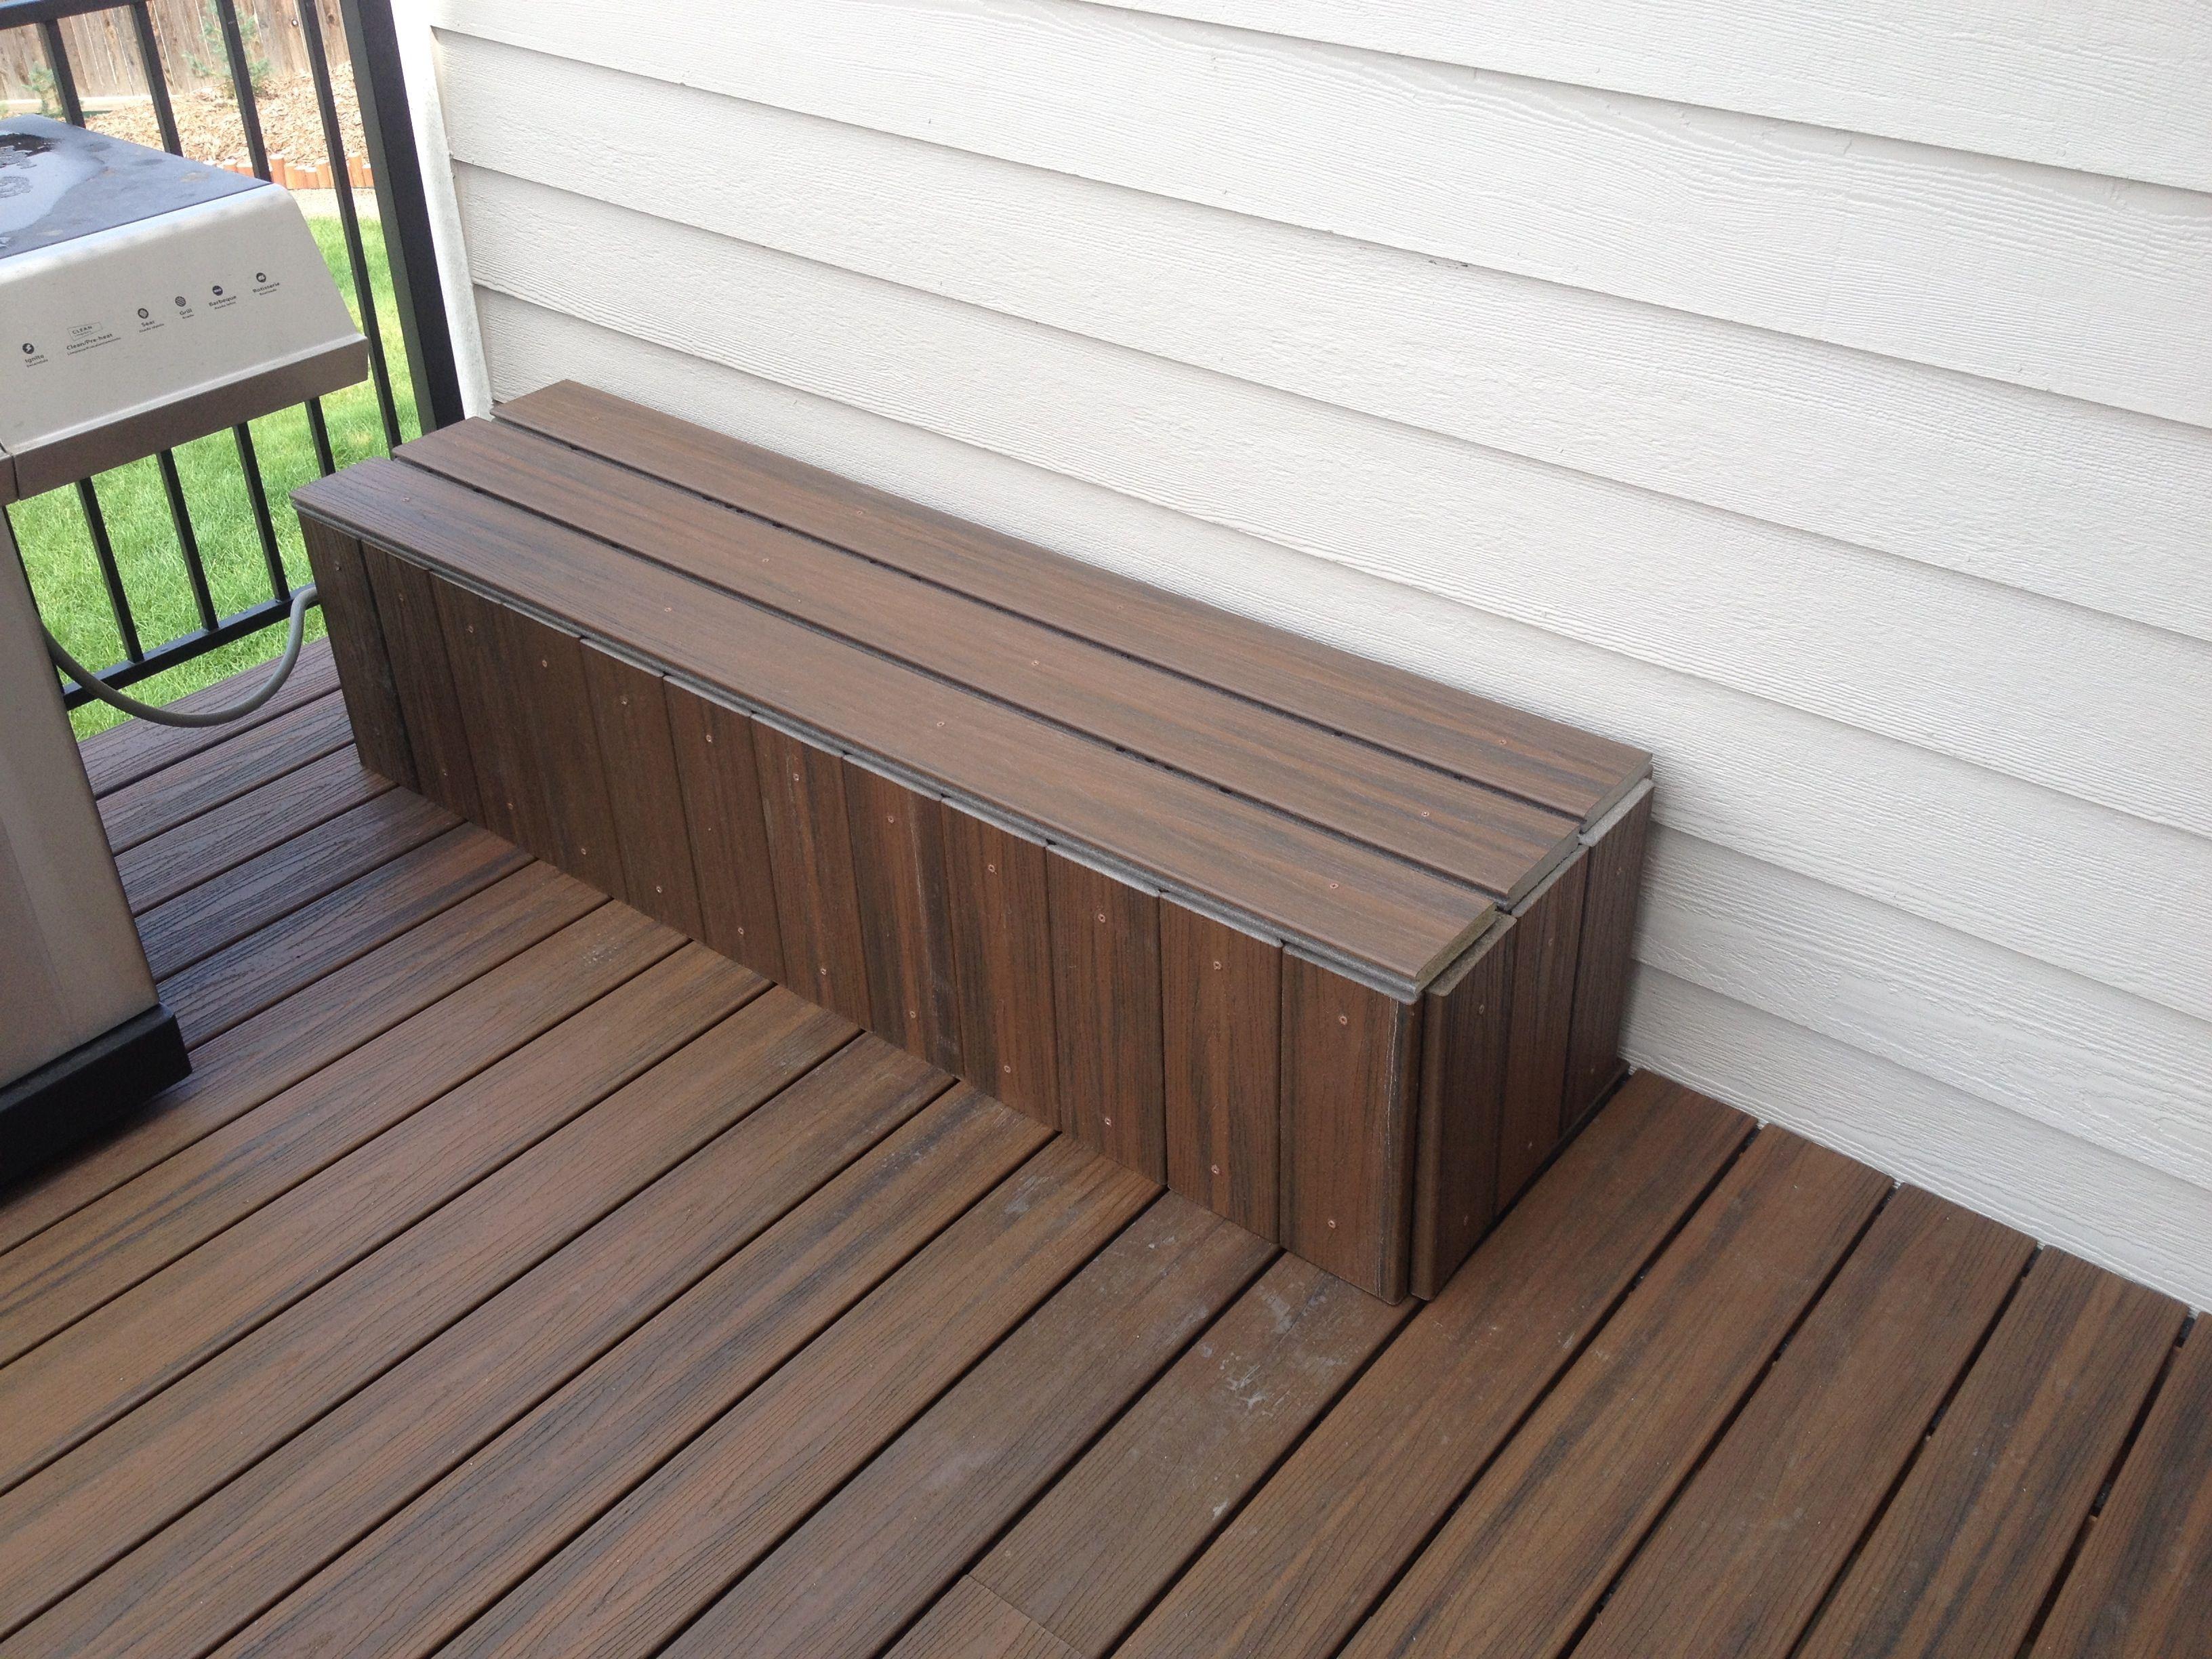 Download Wallpaper Patio Furniture For Trex Deck